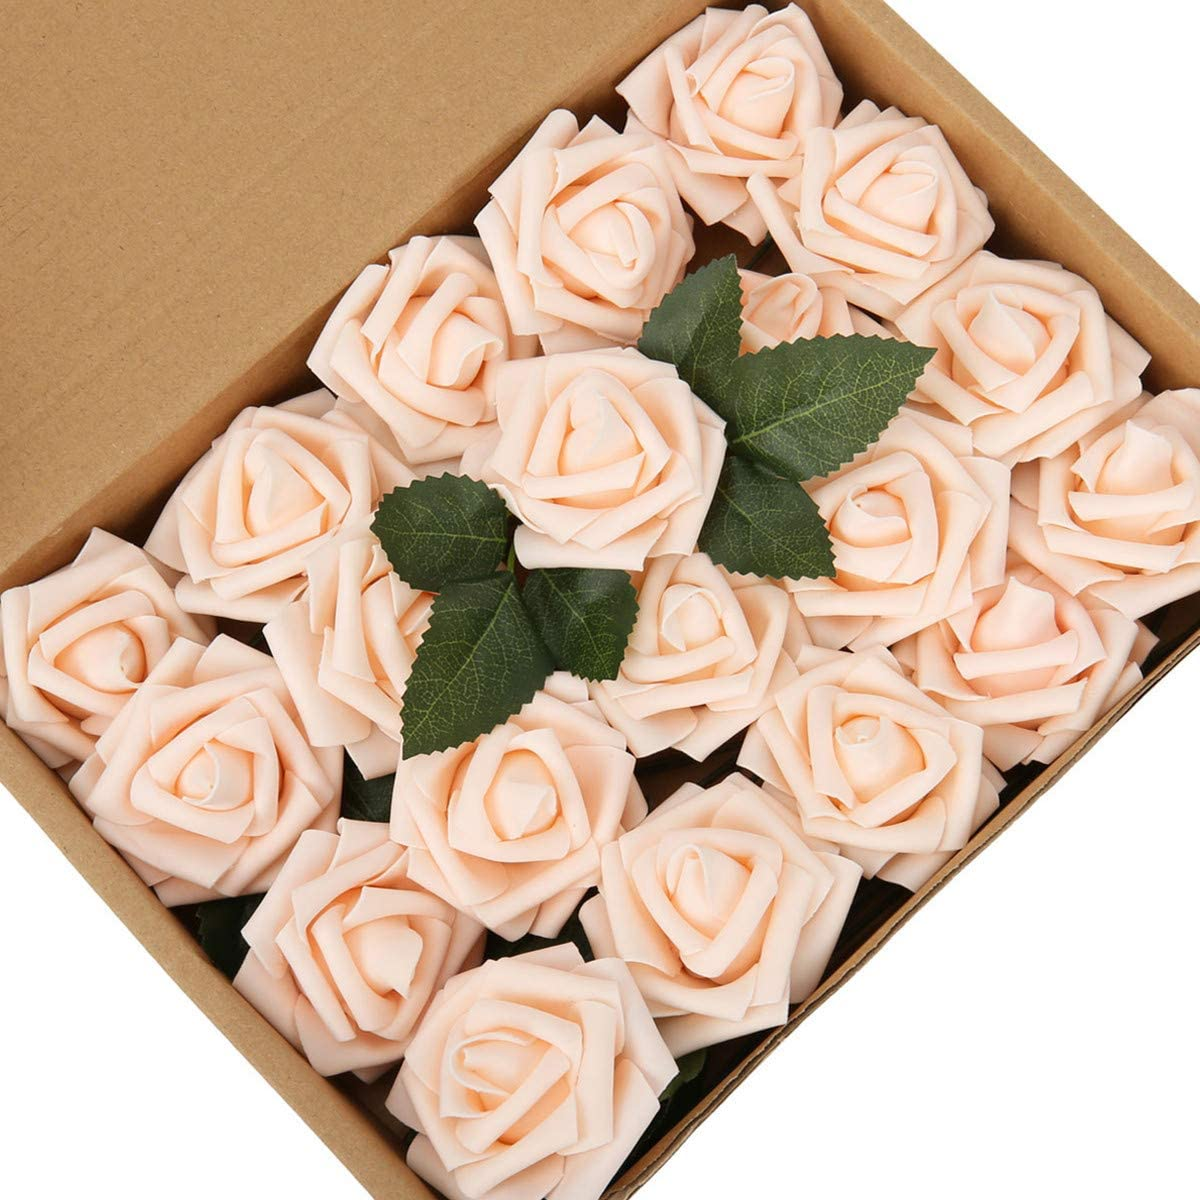 LIVILAN Champagne Artificial Roses Flowers with Stem and Leaf 20pcs Fake Foam Roses Faux Flower for DIY Artificial Flower Arrangement Wedding Bouquets Centerpiece Bridal Shower Party Home Decoration